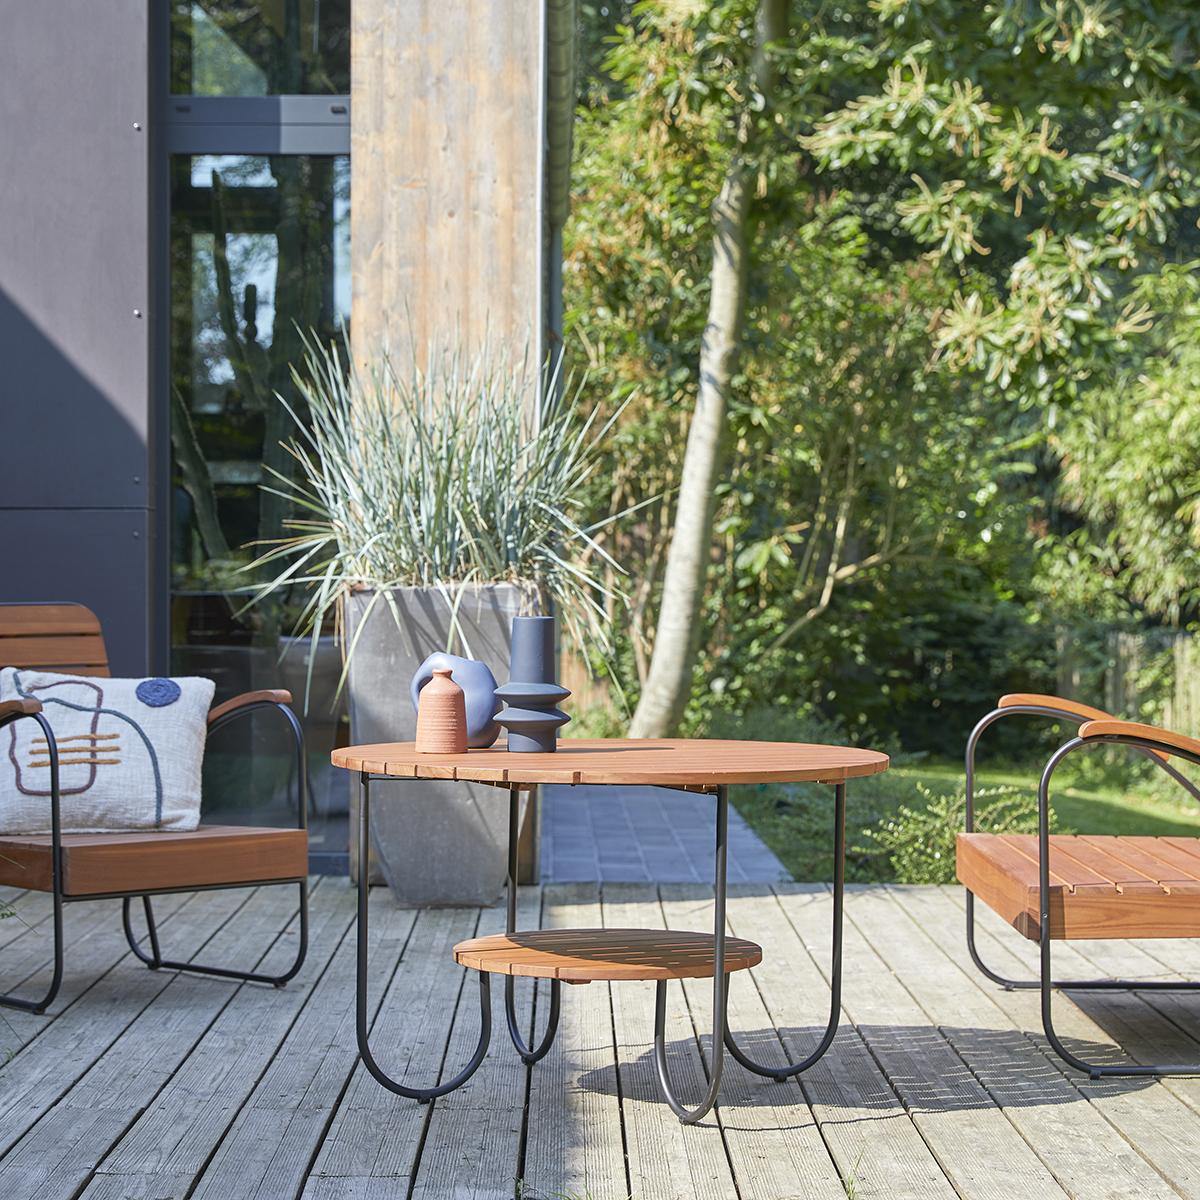 Key Wood solid teak slatted garden Coffee Table